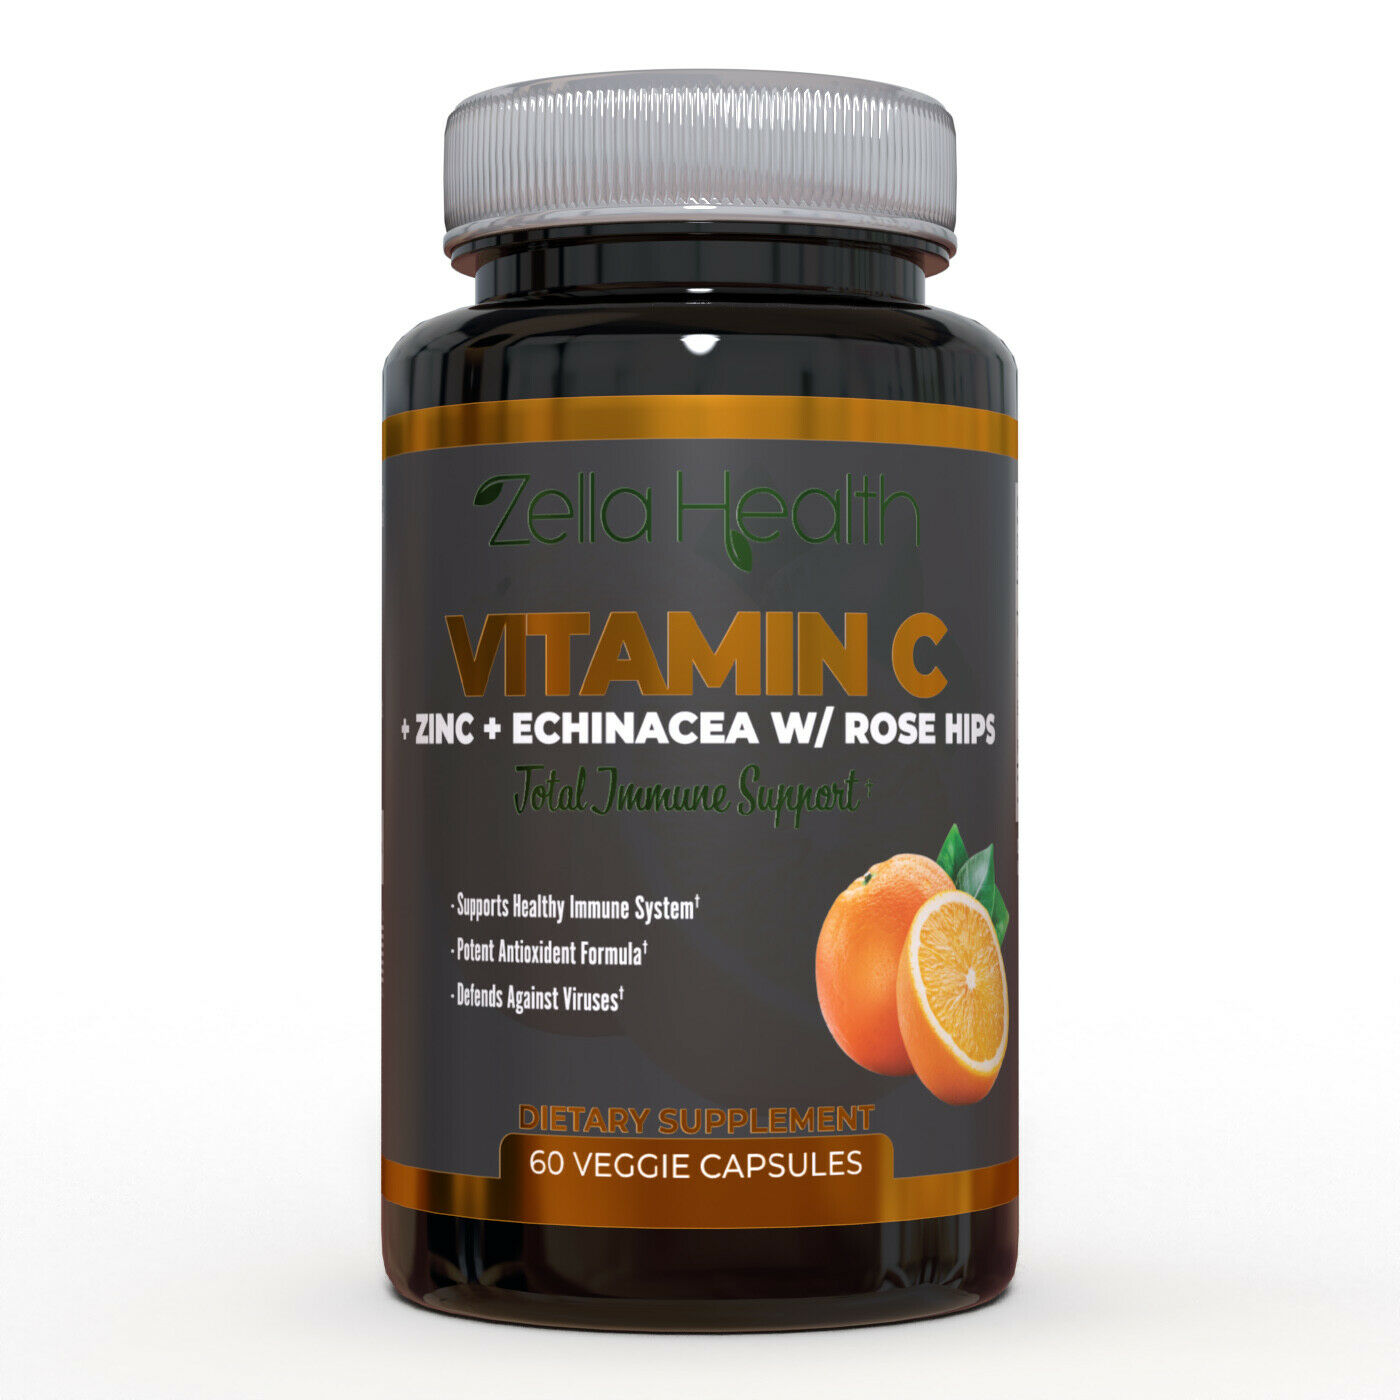 Zella Health - Vitamin C 1000mg w/ Zinc, Echinacea, Rose Hips - 60 Capsules  1